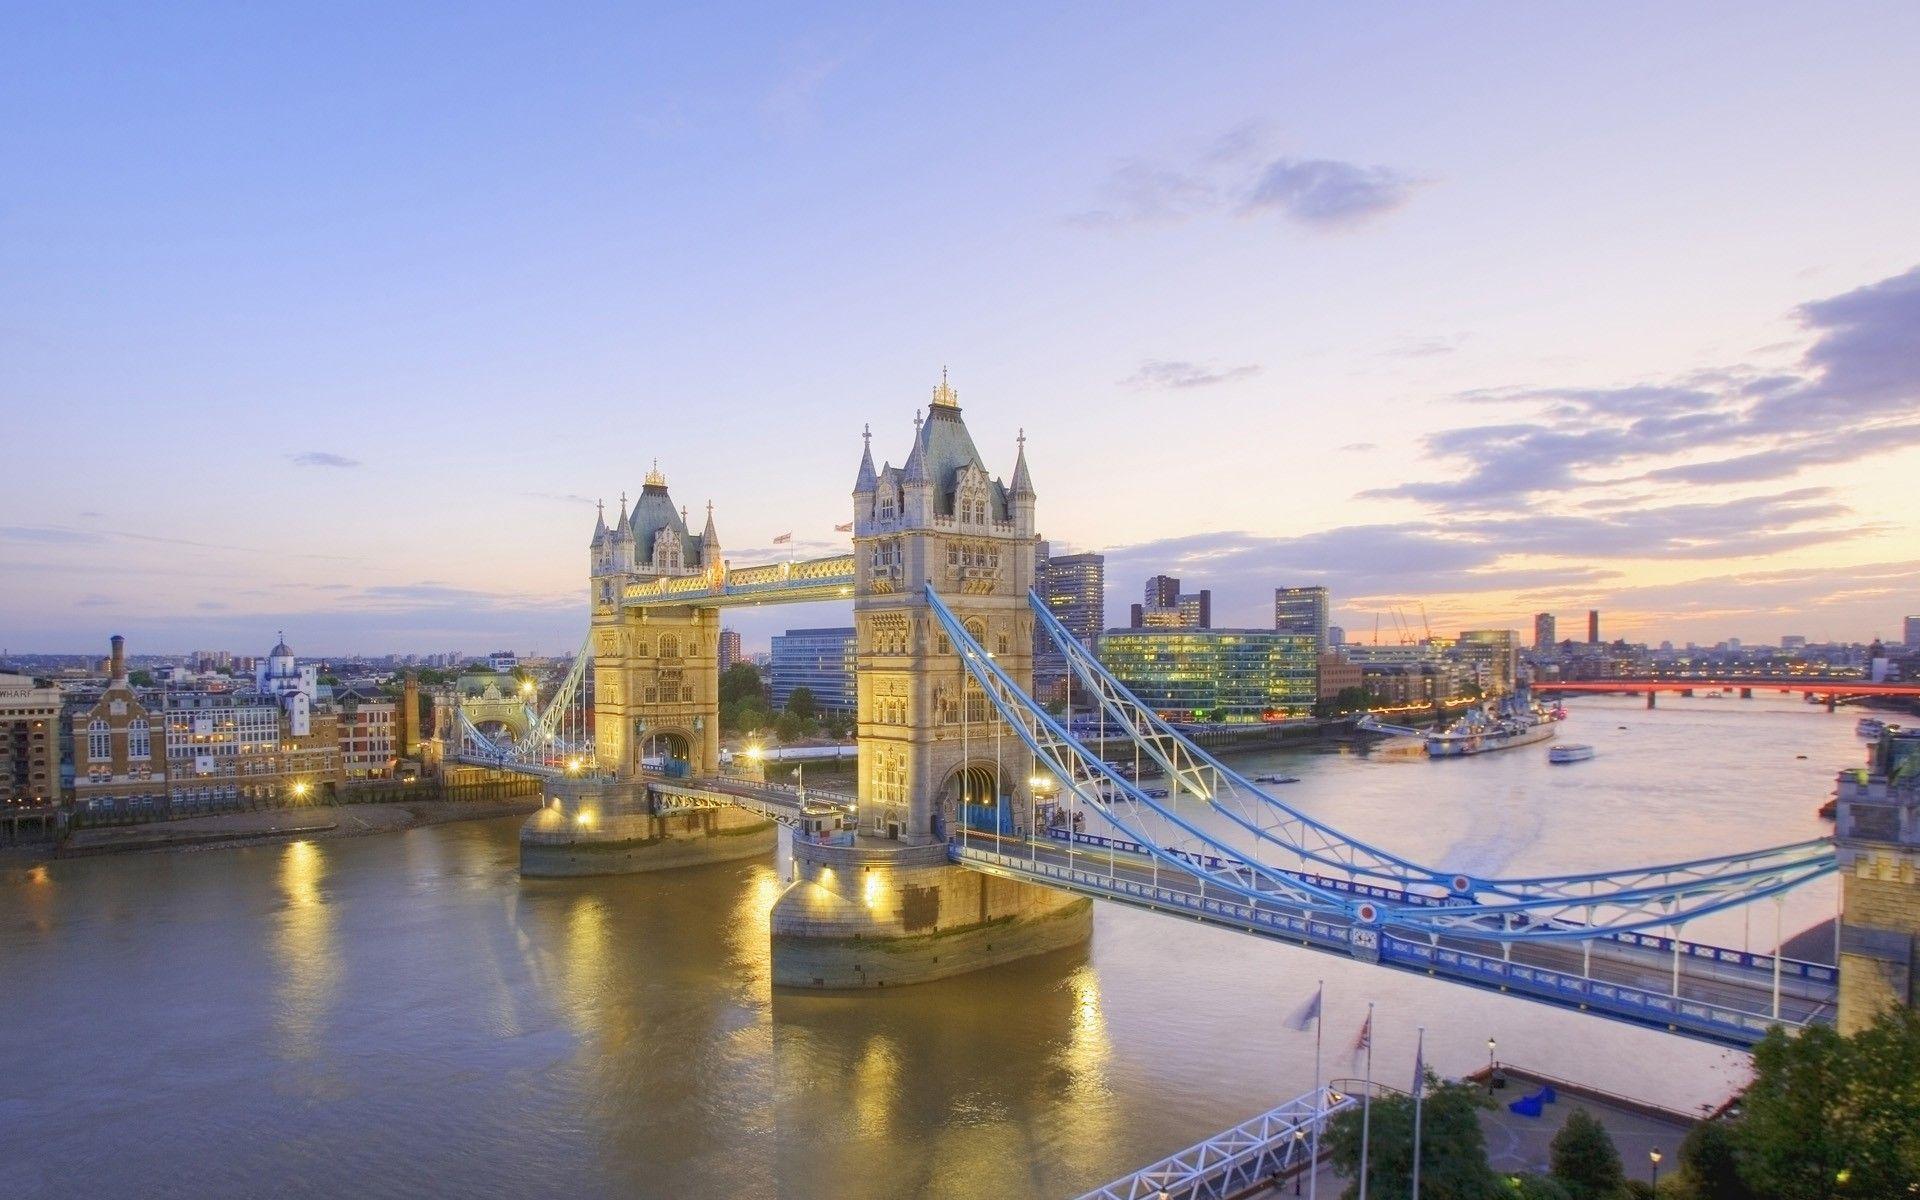 wallpaper bridge london scenic - photo #8